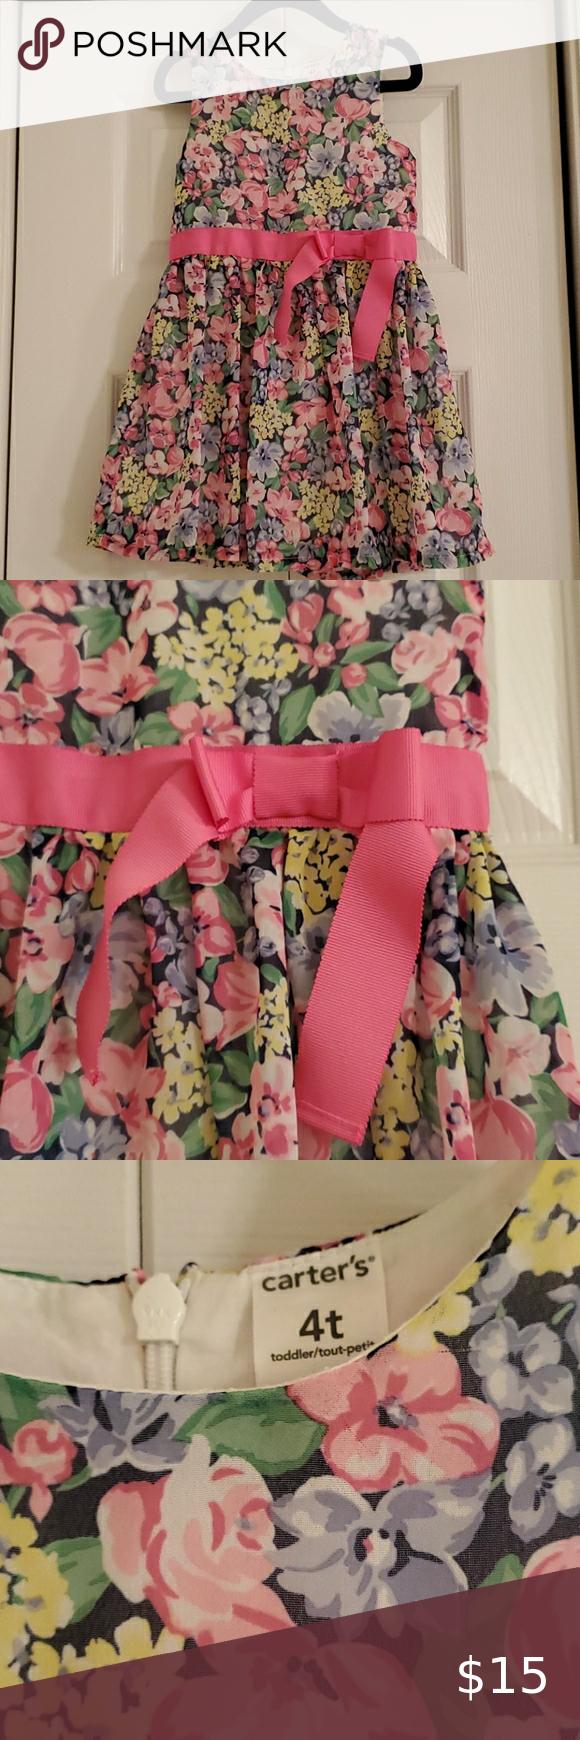 Carter S Party Dress 4t In 2020 Party Dress 4t Dress Girls Party Dress [ 1740 x 580 Pixel ]